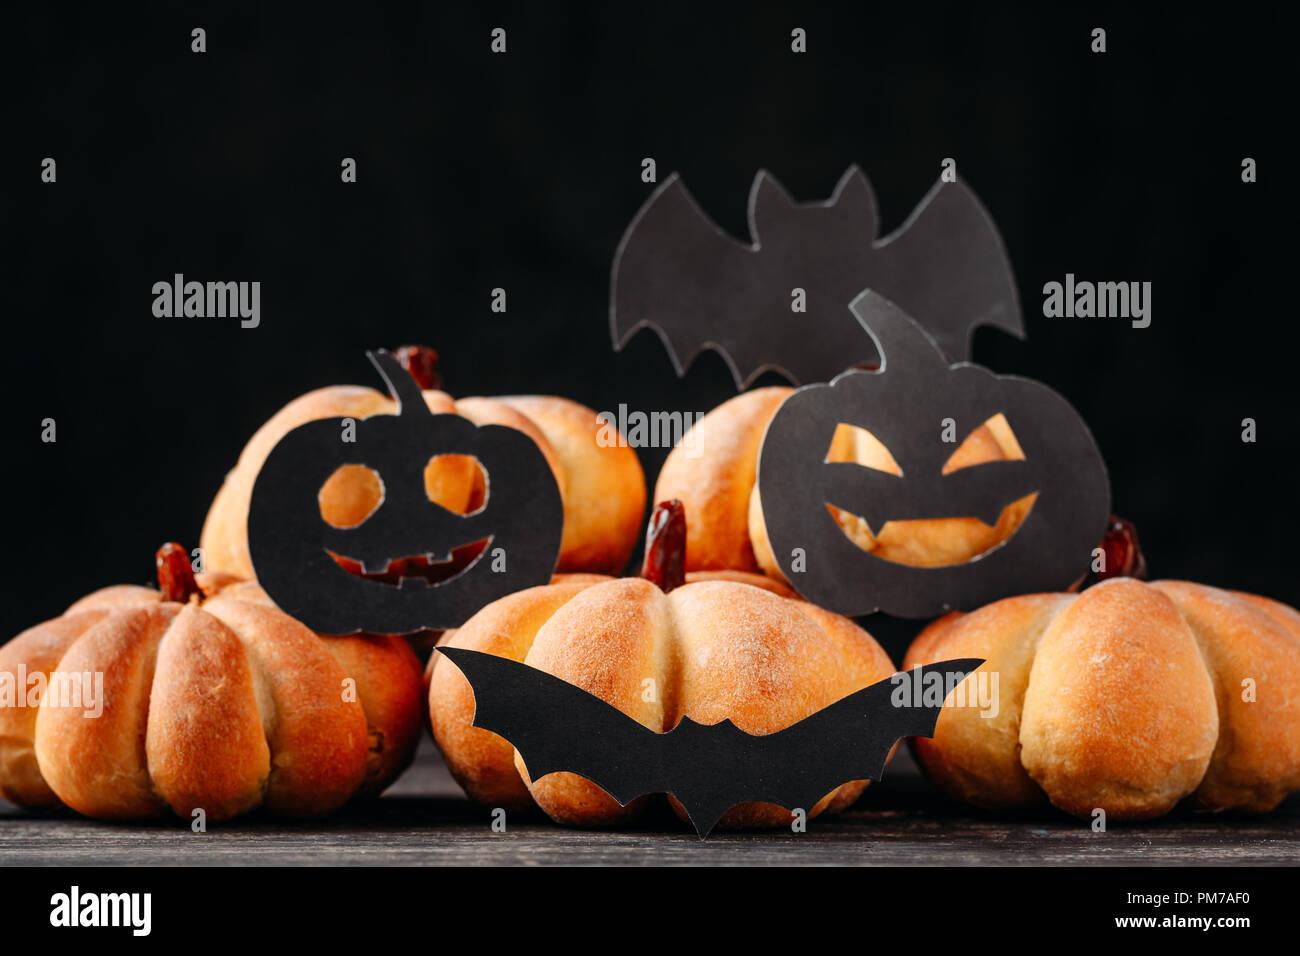 homemade halloween cakes in shape of pumpkin on dark background hallooween sweets stock image